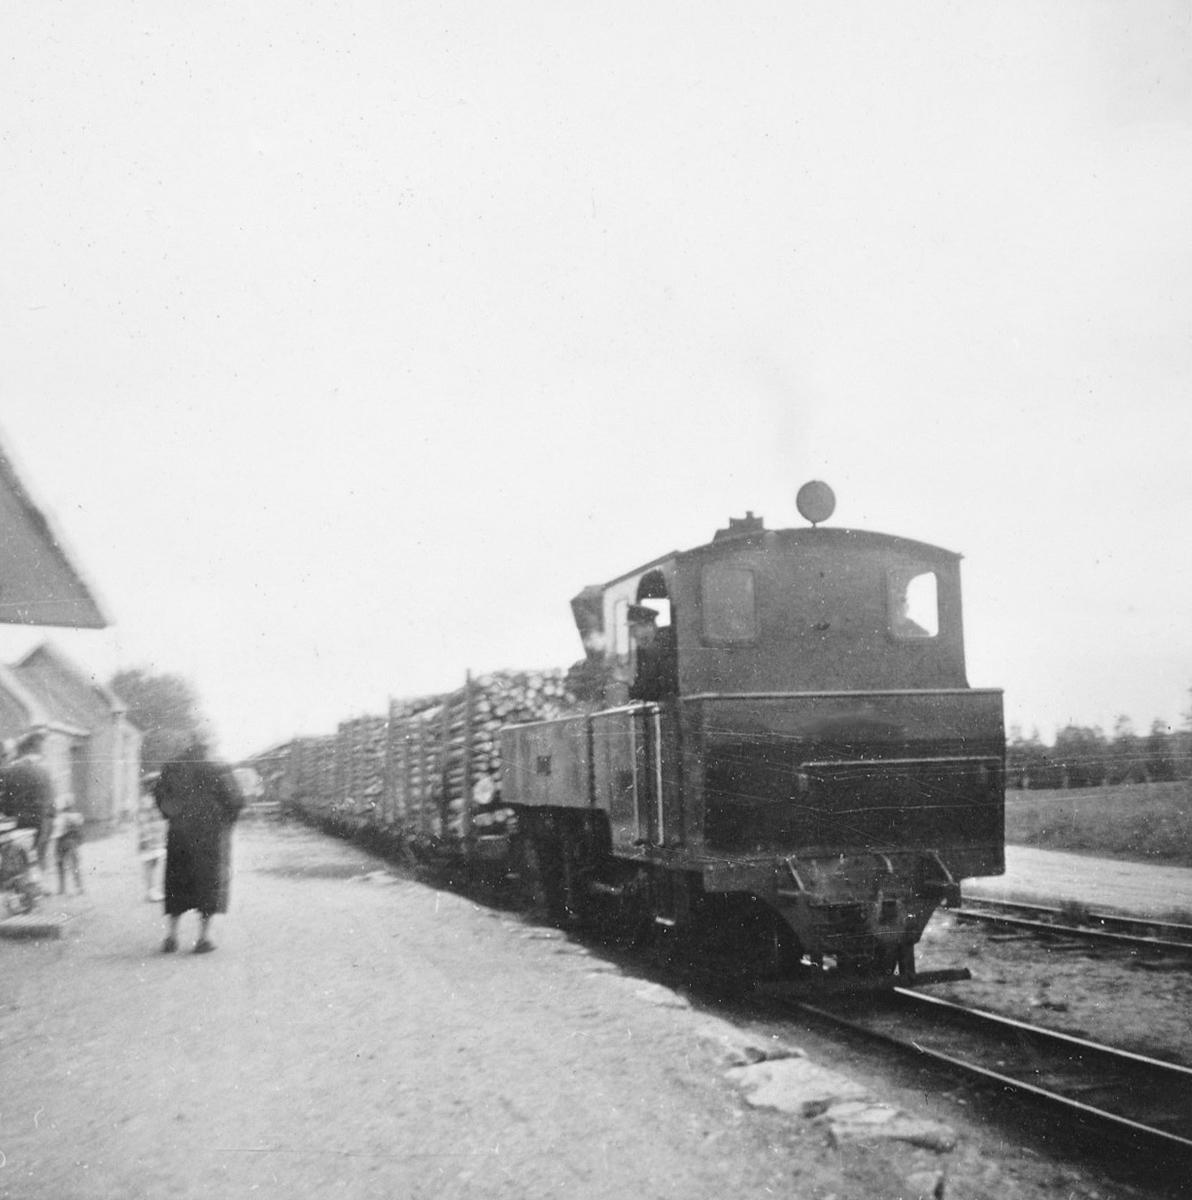 Damplokomotiv XXIXb nr. 7 PRYDZ med tog til Skulerud på Lierfoss stasjon. Fremst i toget fullastede tømmervogner